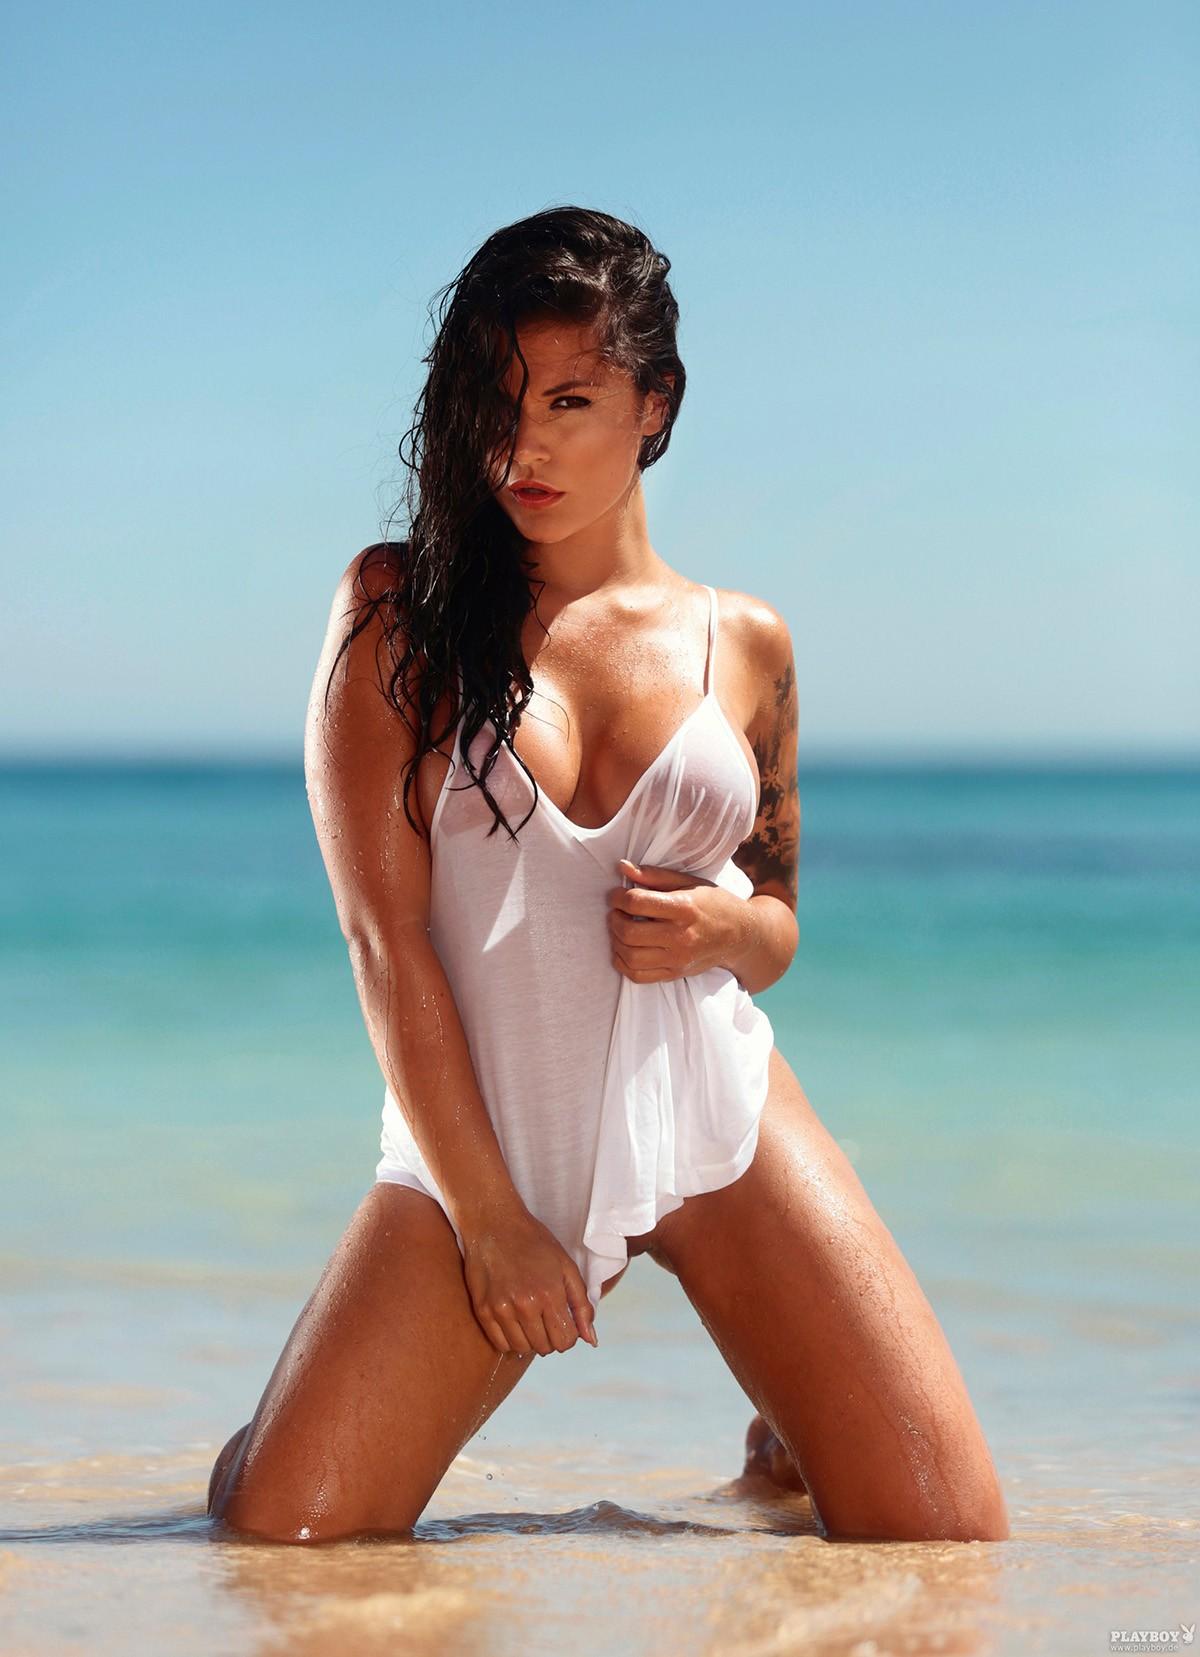 Brunette beach pics 90